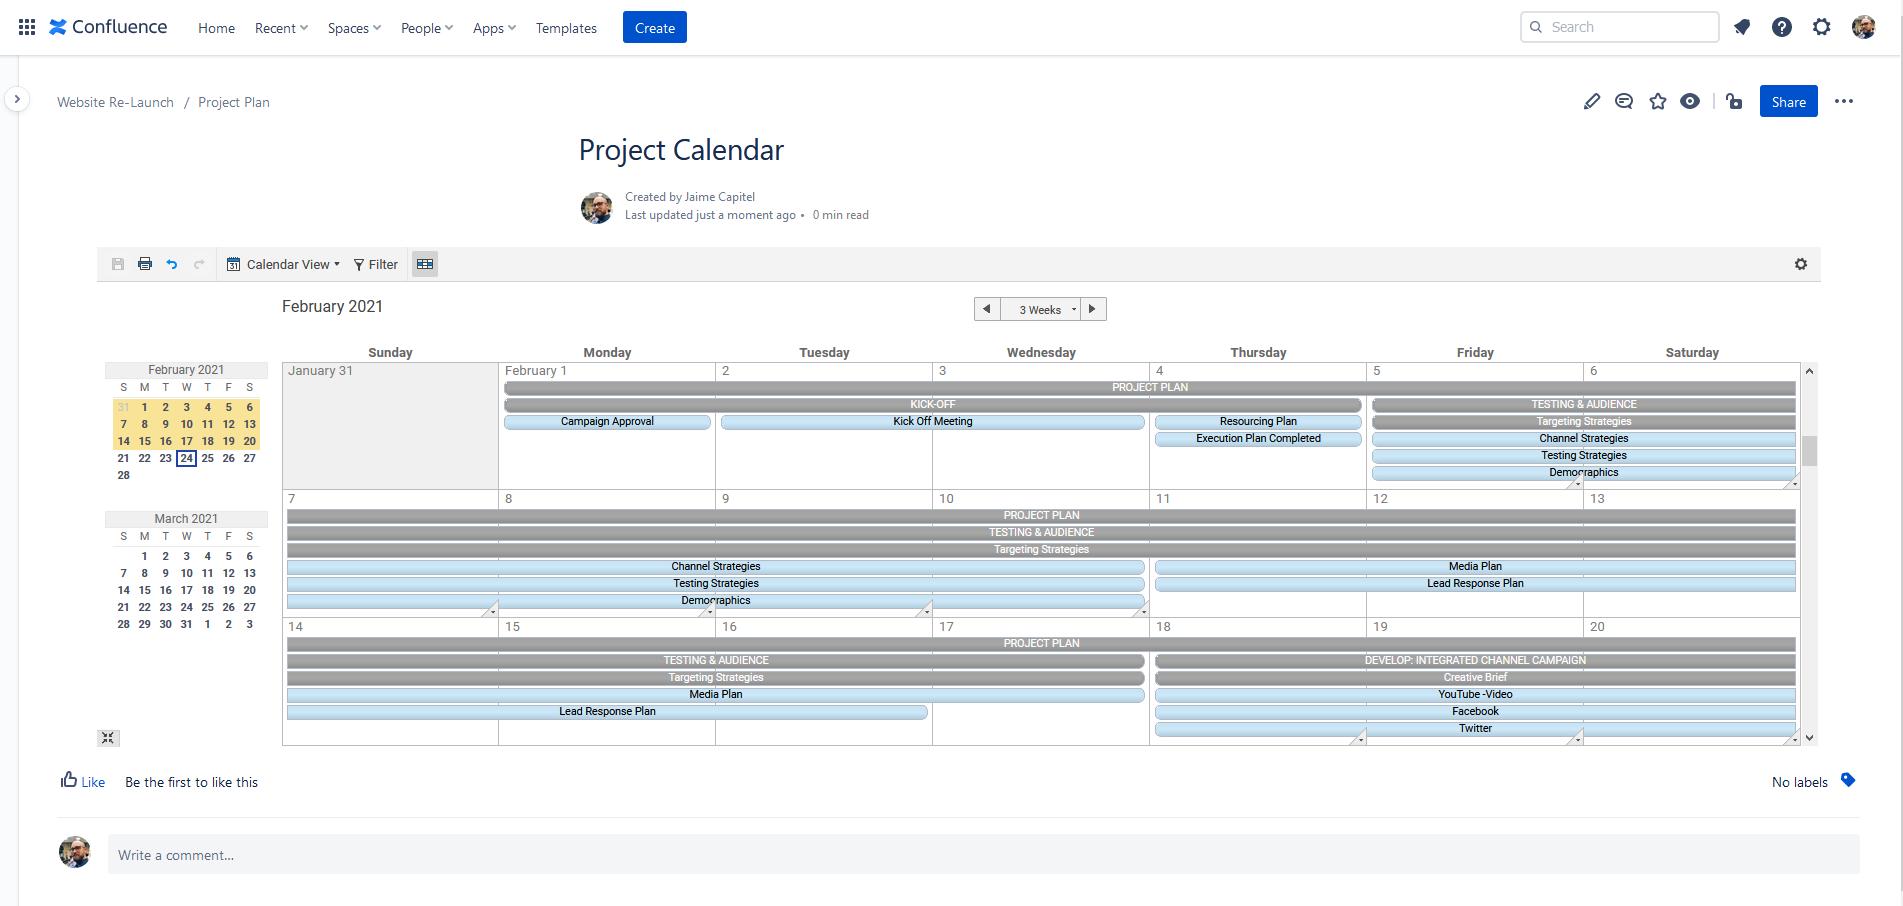 Smartsheet calendar view embedded in Confluence